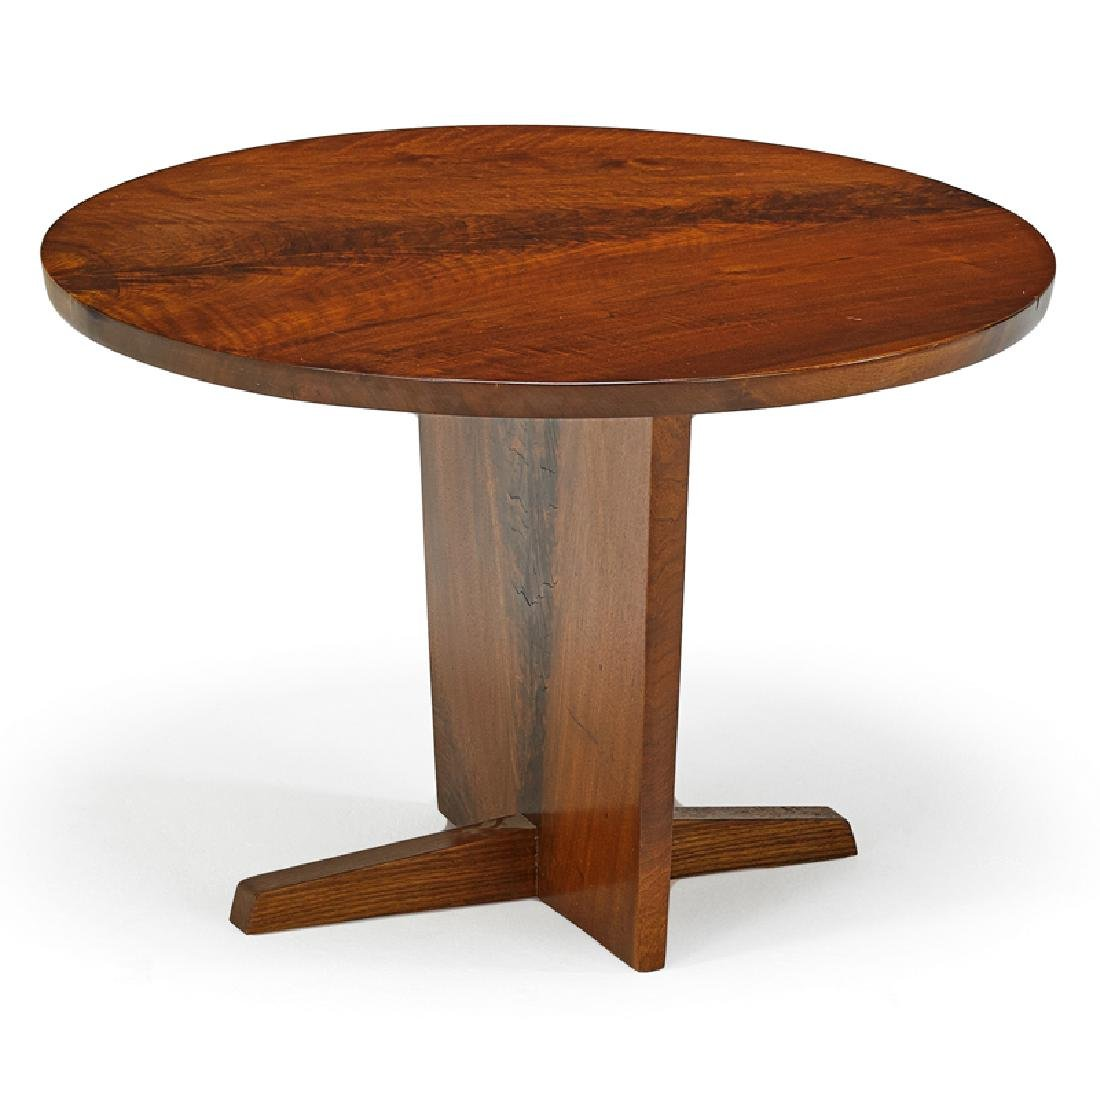 GEORGE NAKASHIMA Minguren coffee table